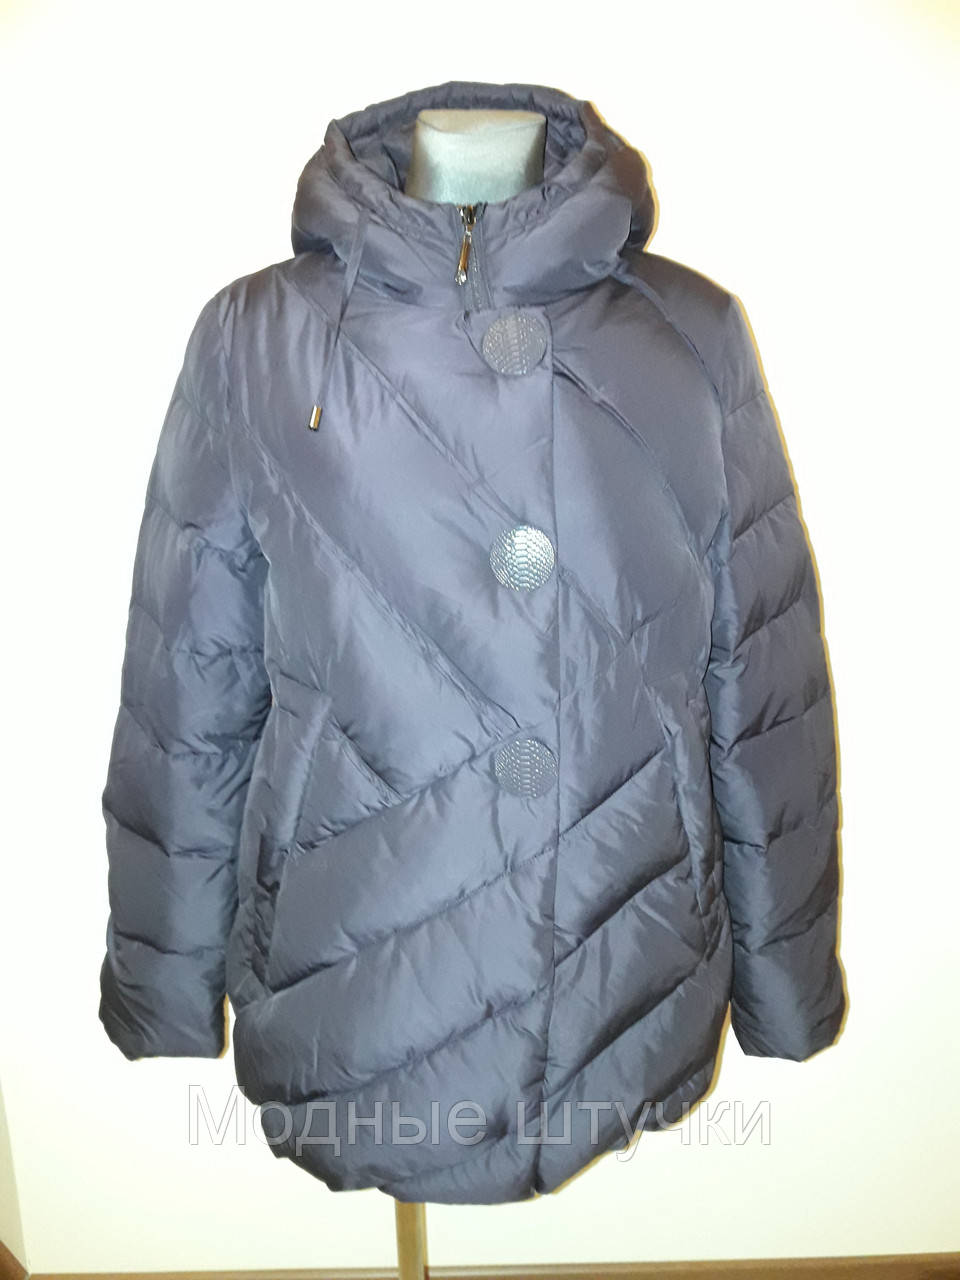 Купить Недорого Осень Куртку